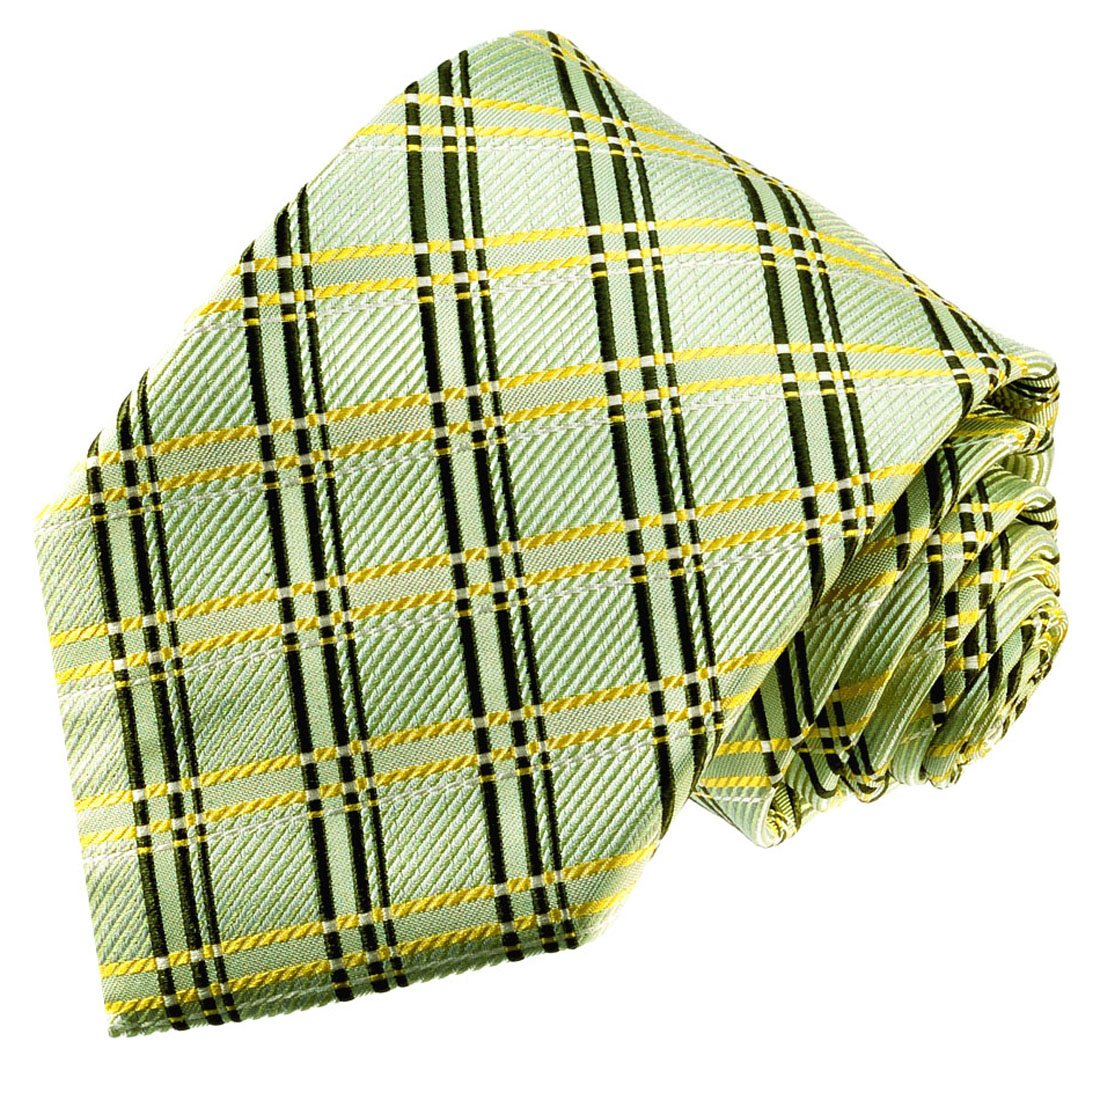 LORENZO CANA - Marcas corbata de seda 100% - Binder verde oro ...